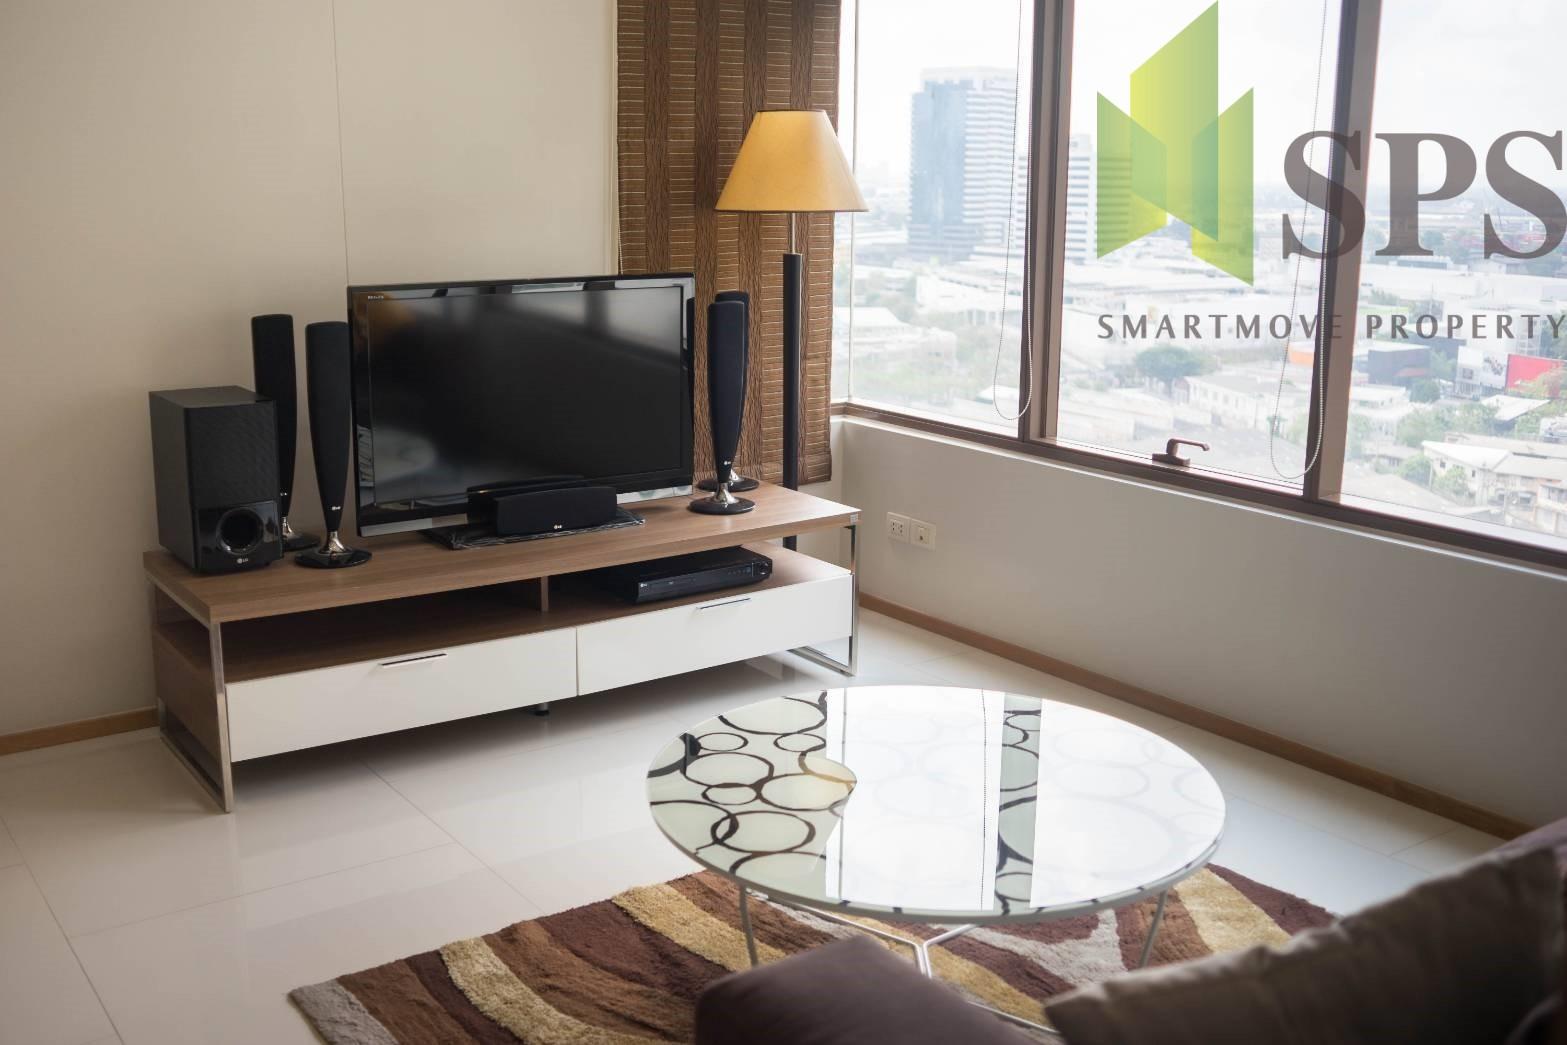 The Emporio Place Condominium ดิ เอ็มโพริโอ เพลส คอนโดให้เช่า ( SPSPE302)